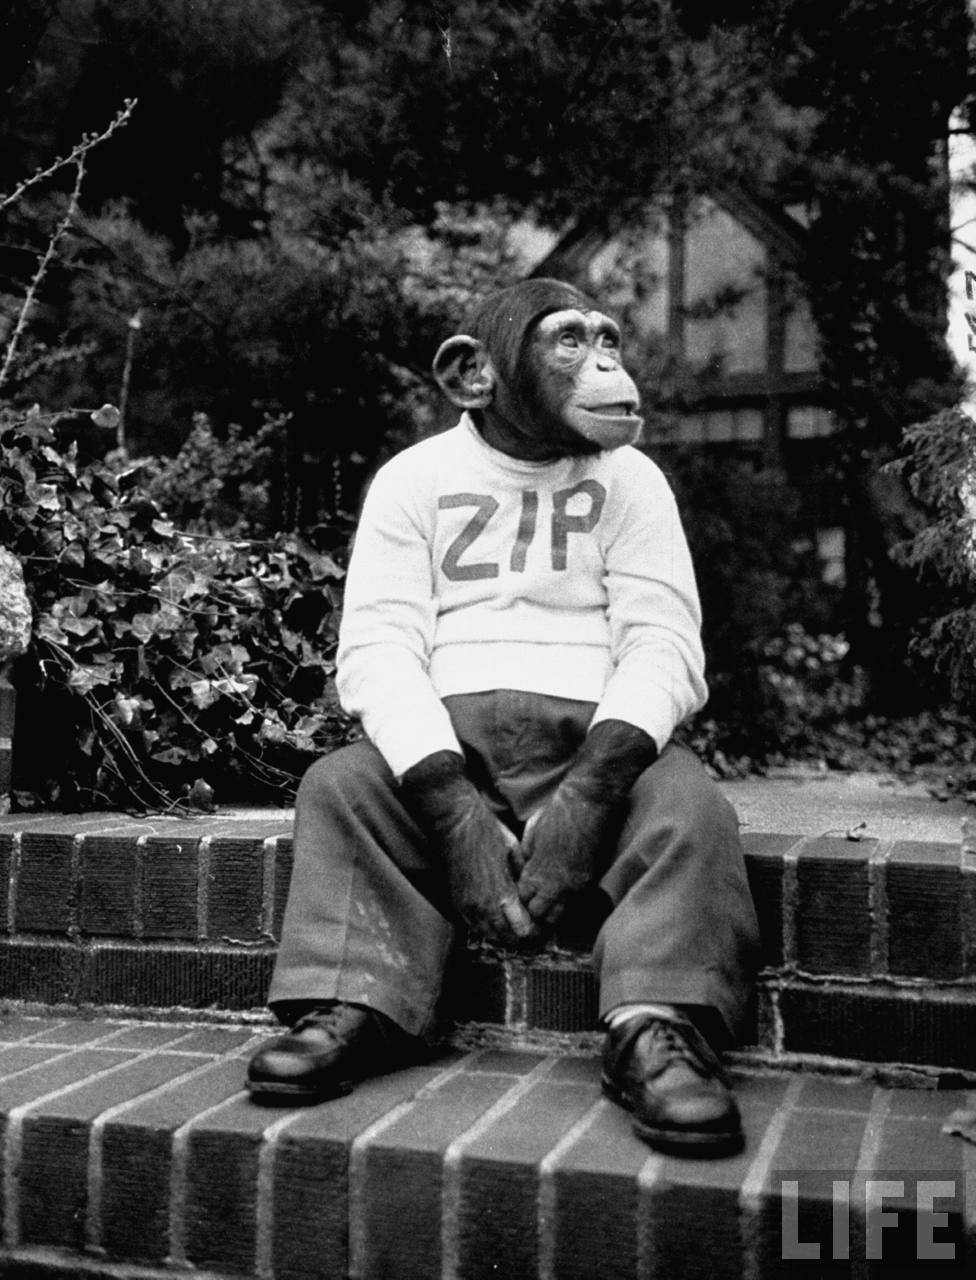 zippy the chimp